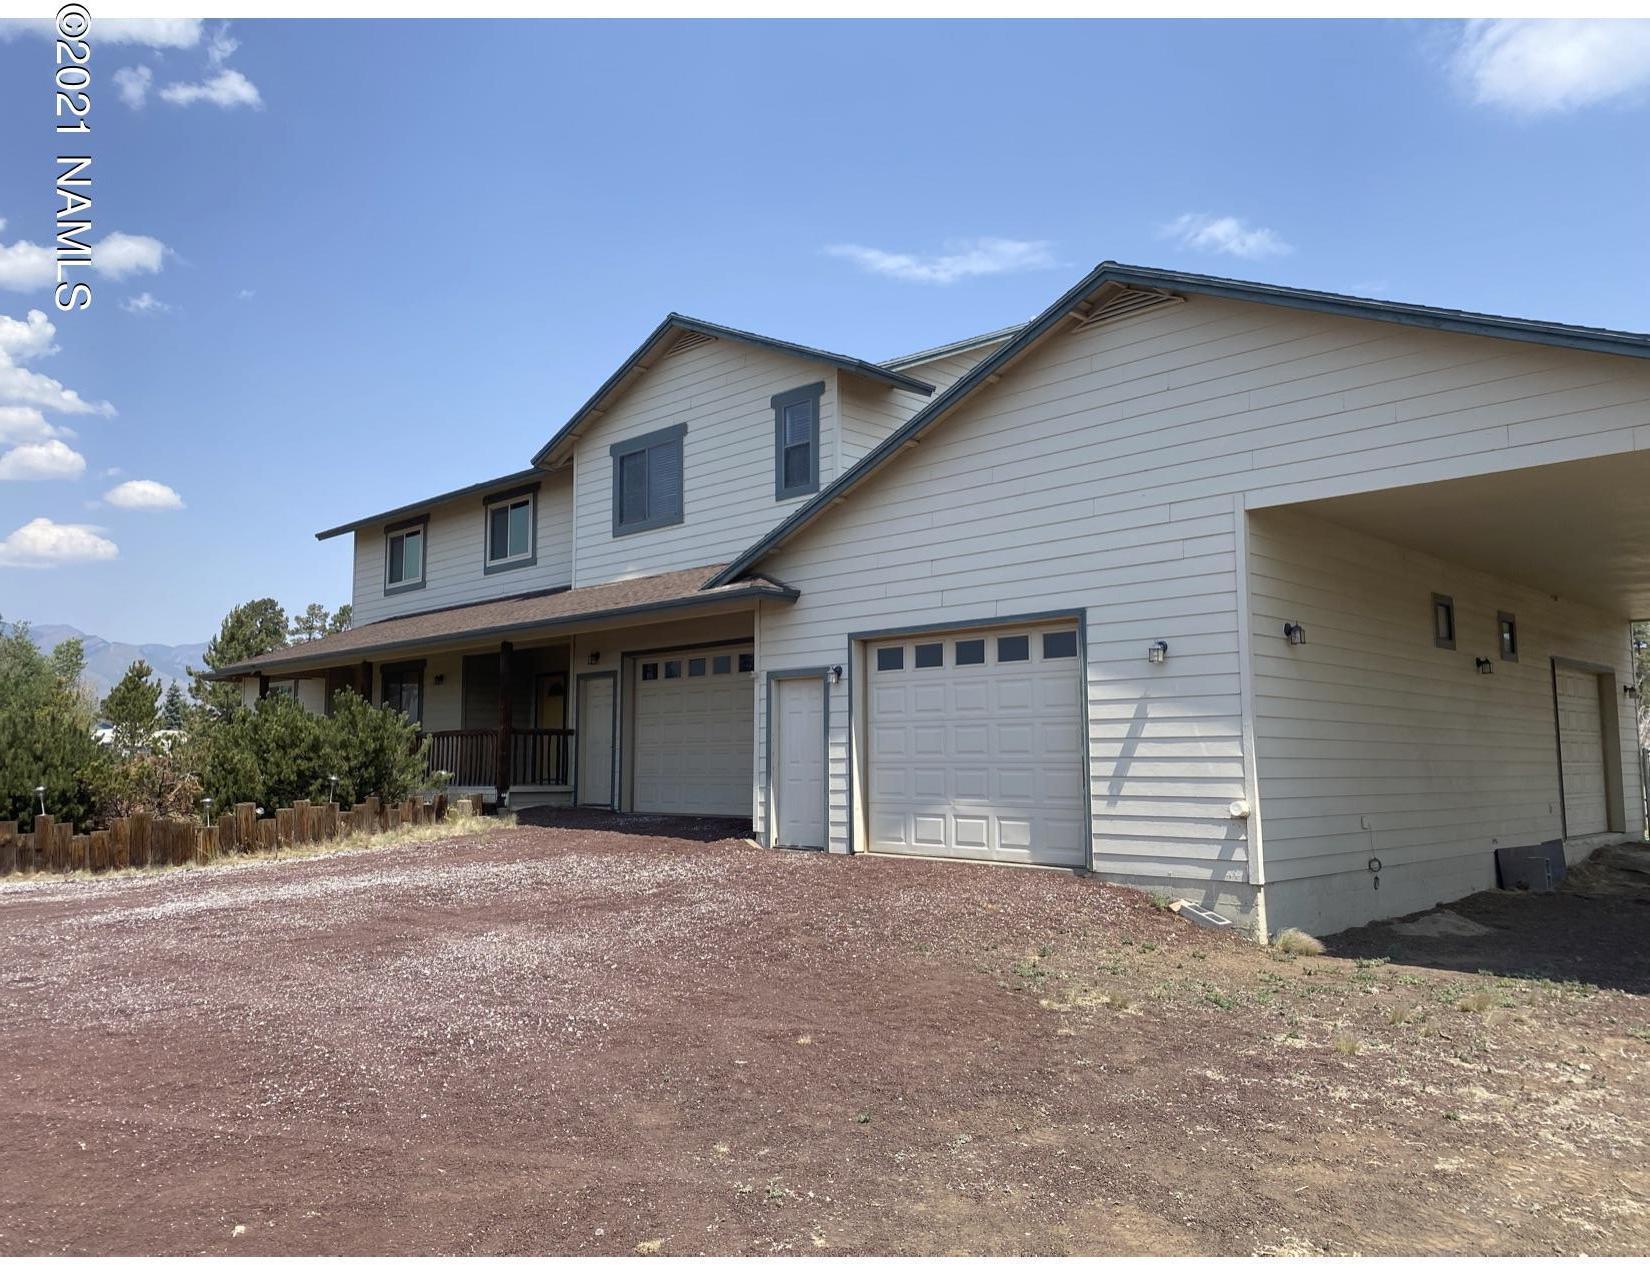 Photo of 8695 Laramie Road, Flagstaff, AZ 86004